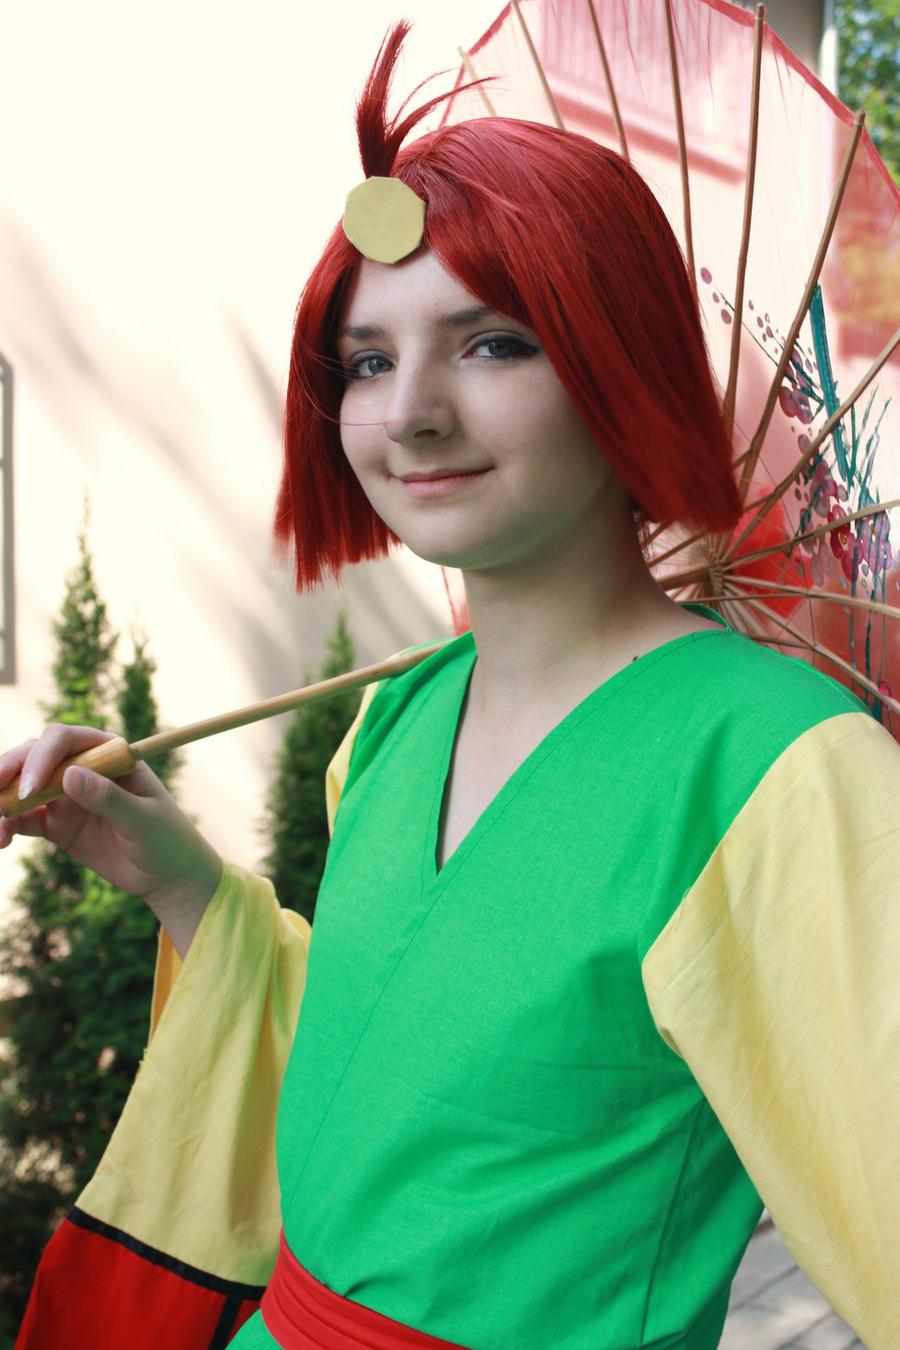 russianbare children girl 5 の掲示板投稿写真&画像